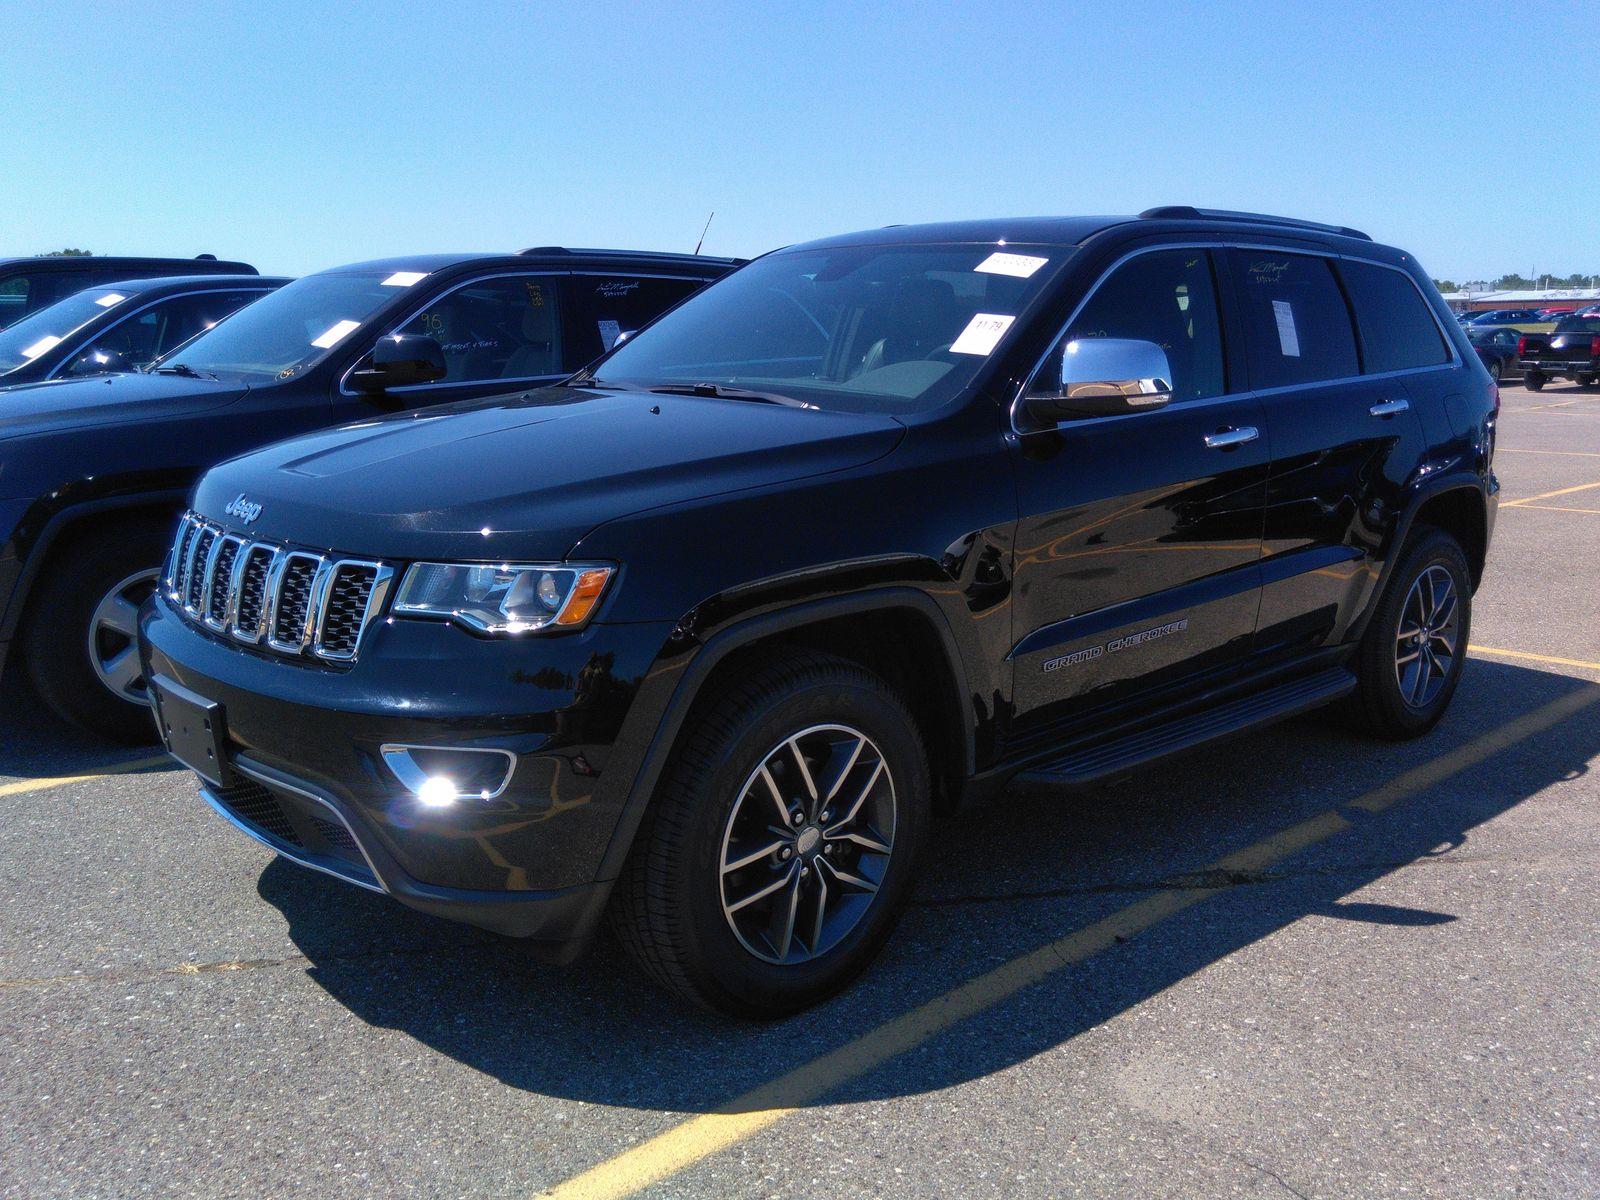 2017 Jeep Grand cherokee 3.6. Lot 99913651931 Vin 1C4RJFBGXHC948336